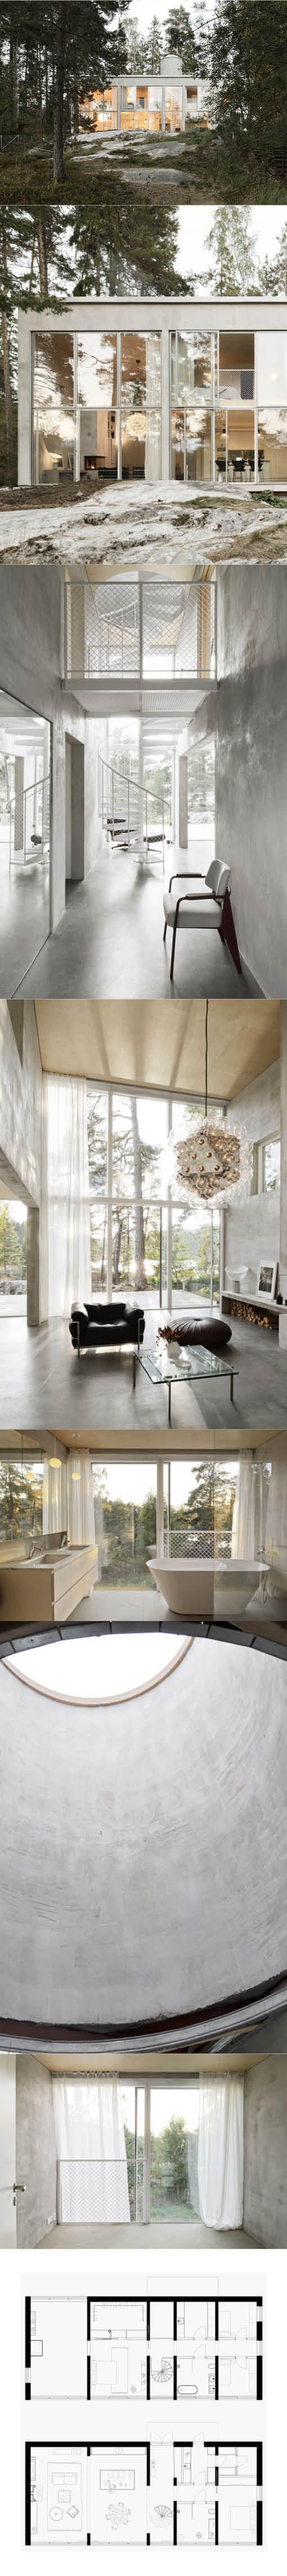 2015 Arrhov Frick Six Walls House Saltsjo Boo Near Stockholm Sweden Concrete Glass White Minimalism House Minimalism Floor Plans